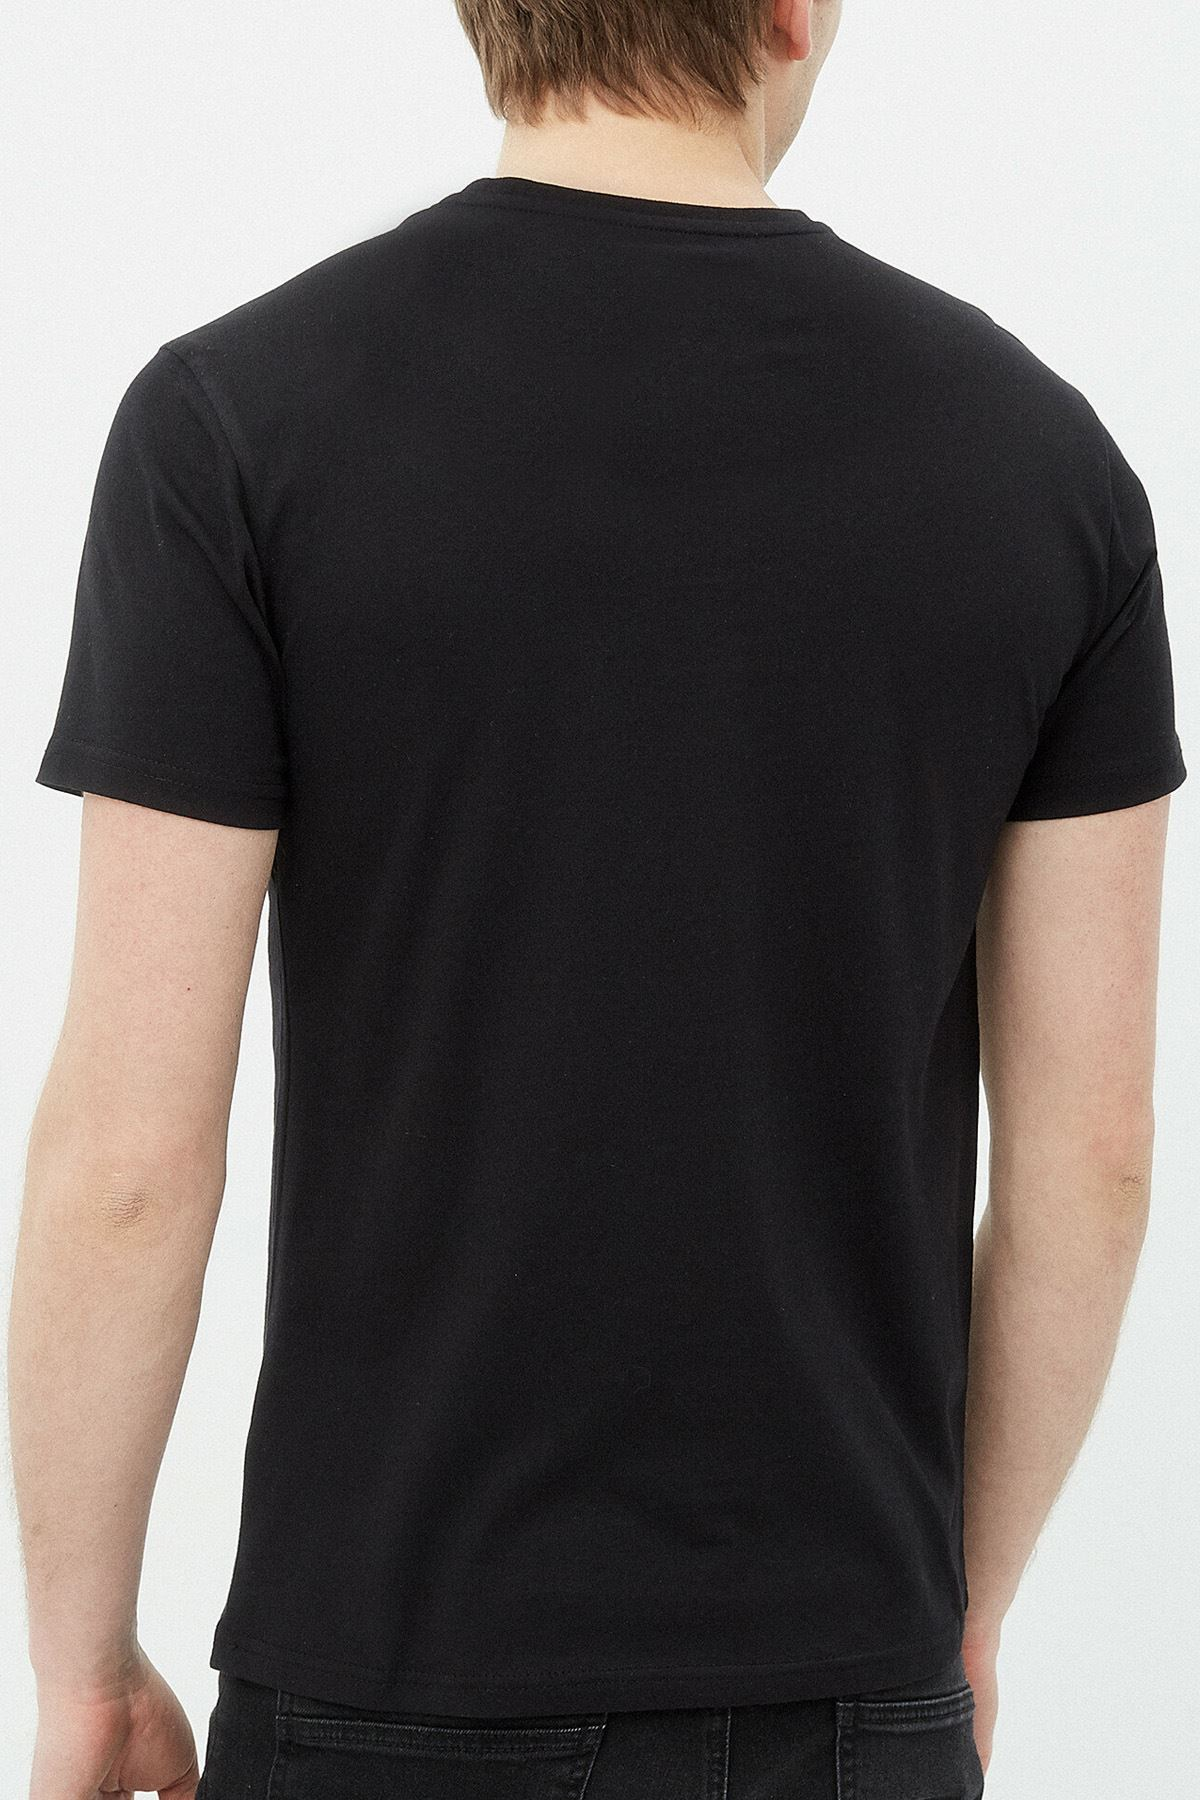 Anime Death Note 12 Siyah Erkek Tshirt - Tişört